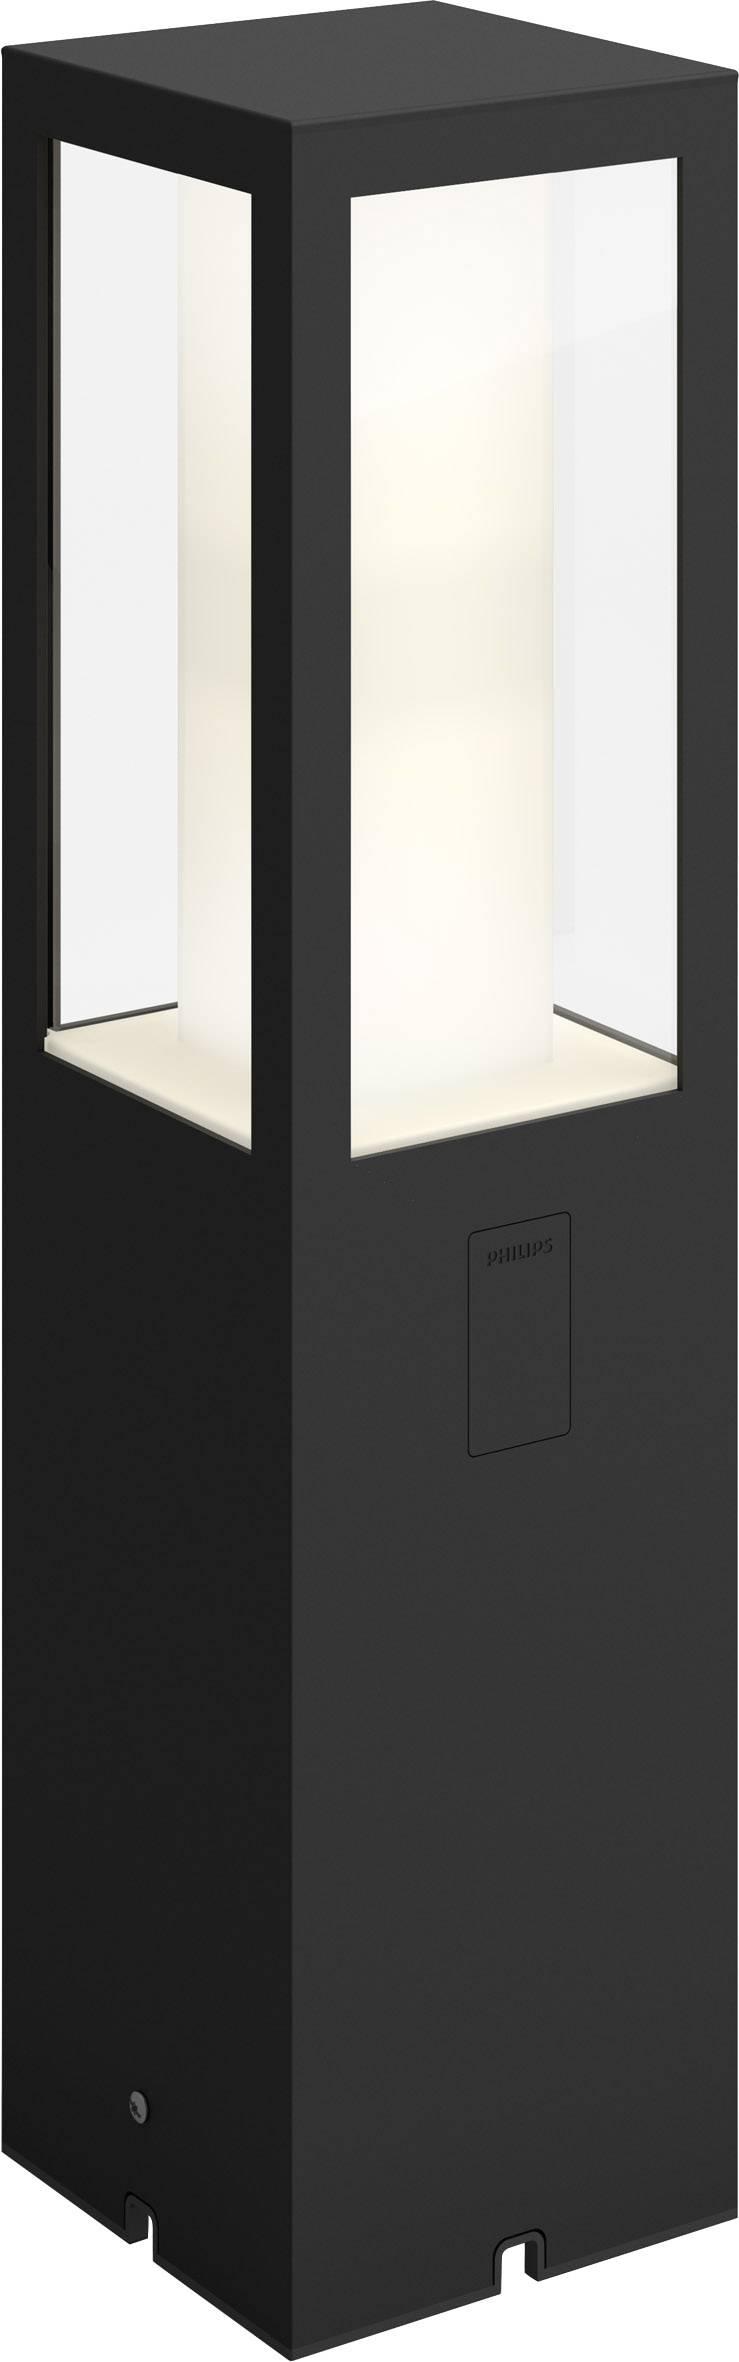 izdelek-philips-lighting-hue-led-zunanja-stojeca-svetilka-razsirite-2